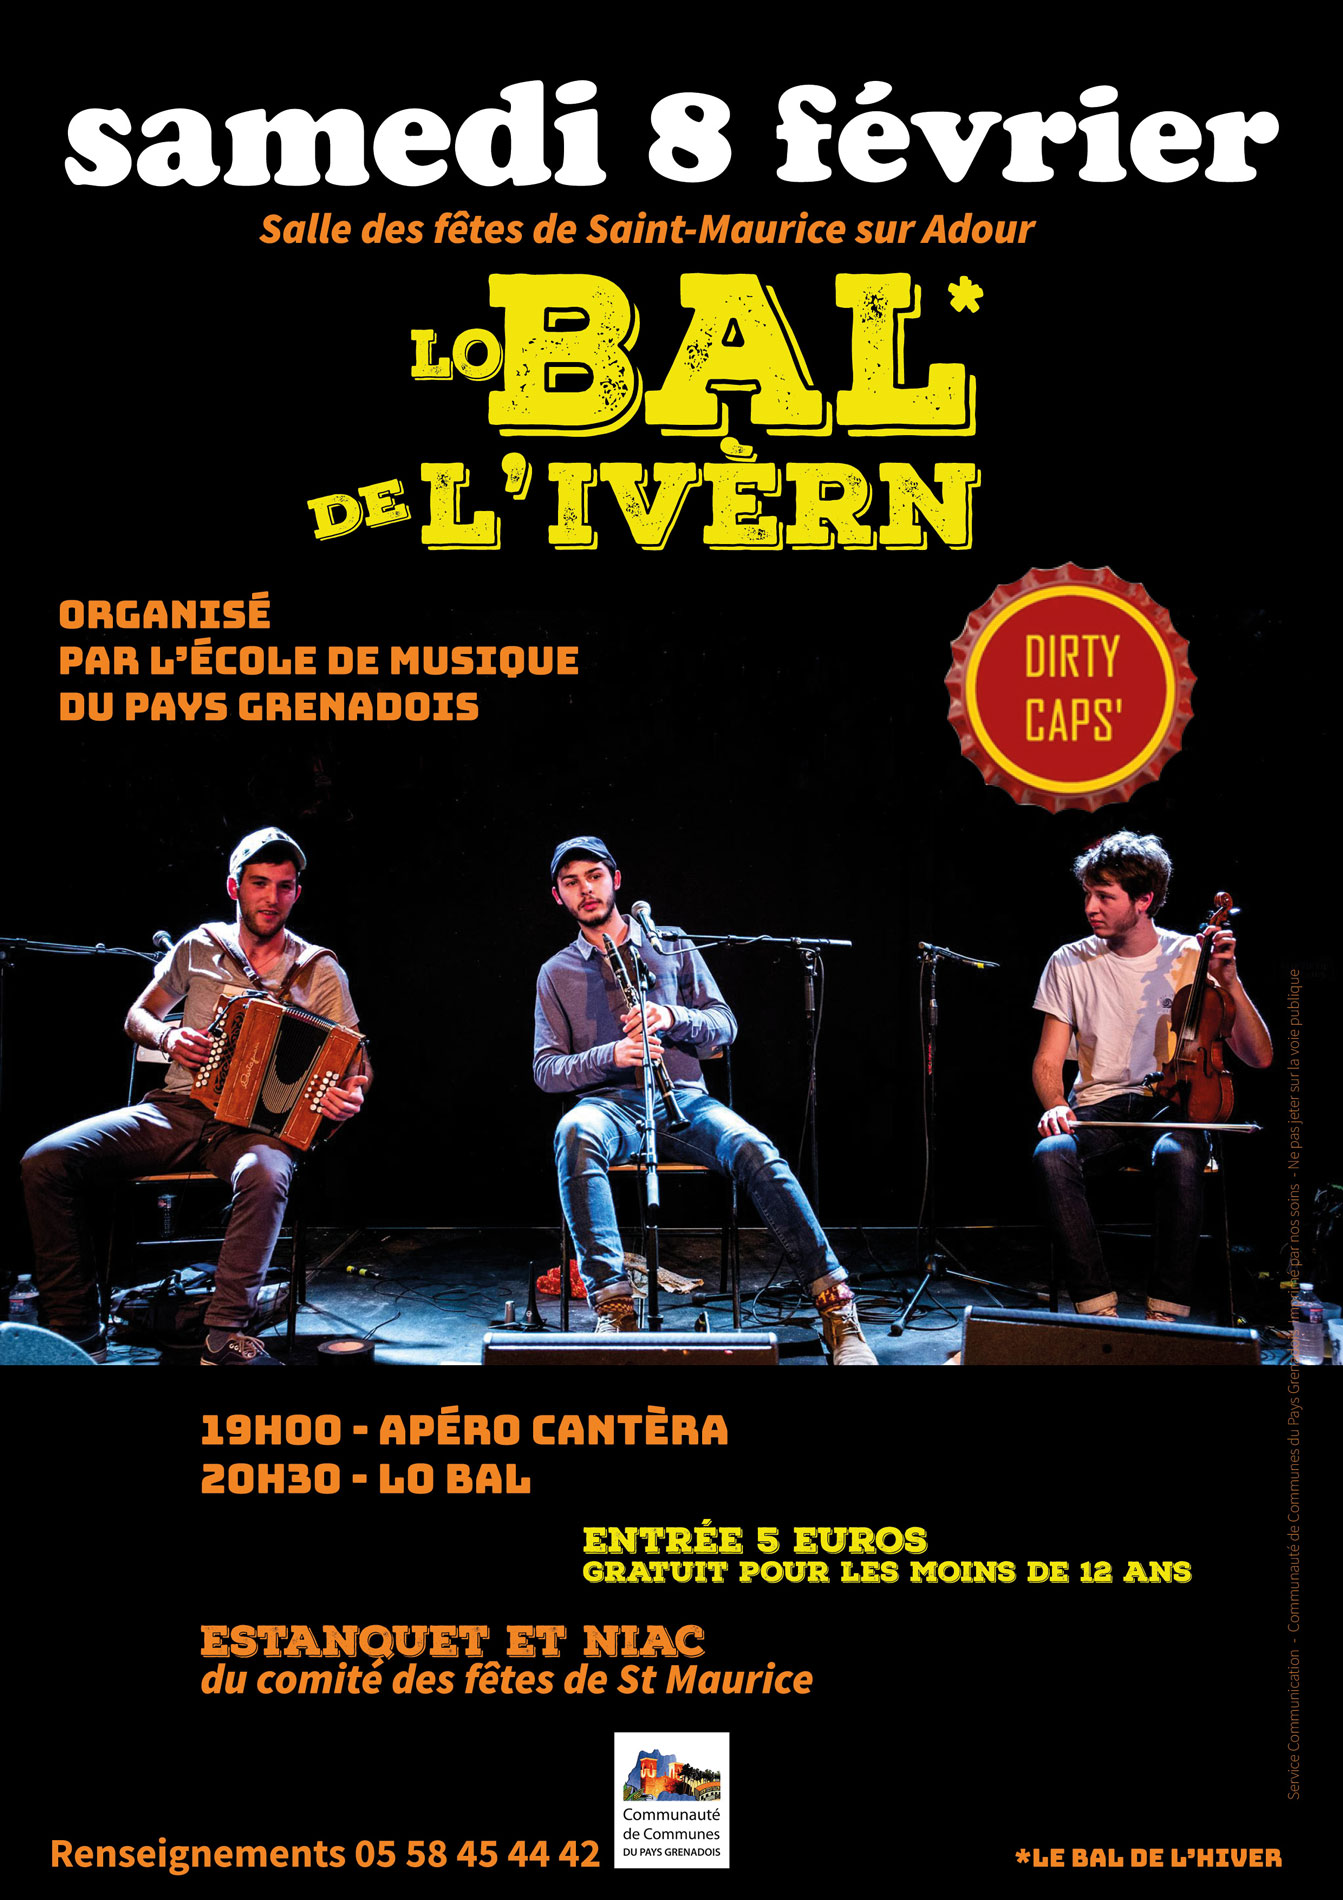 Bal trad 2eme edition diry caps 8 fevrier